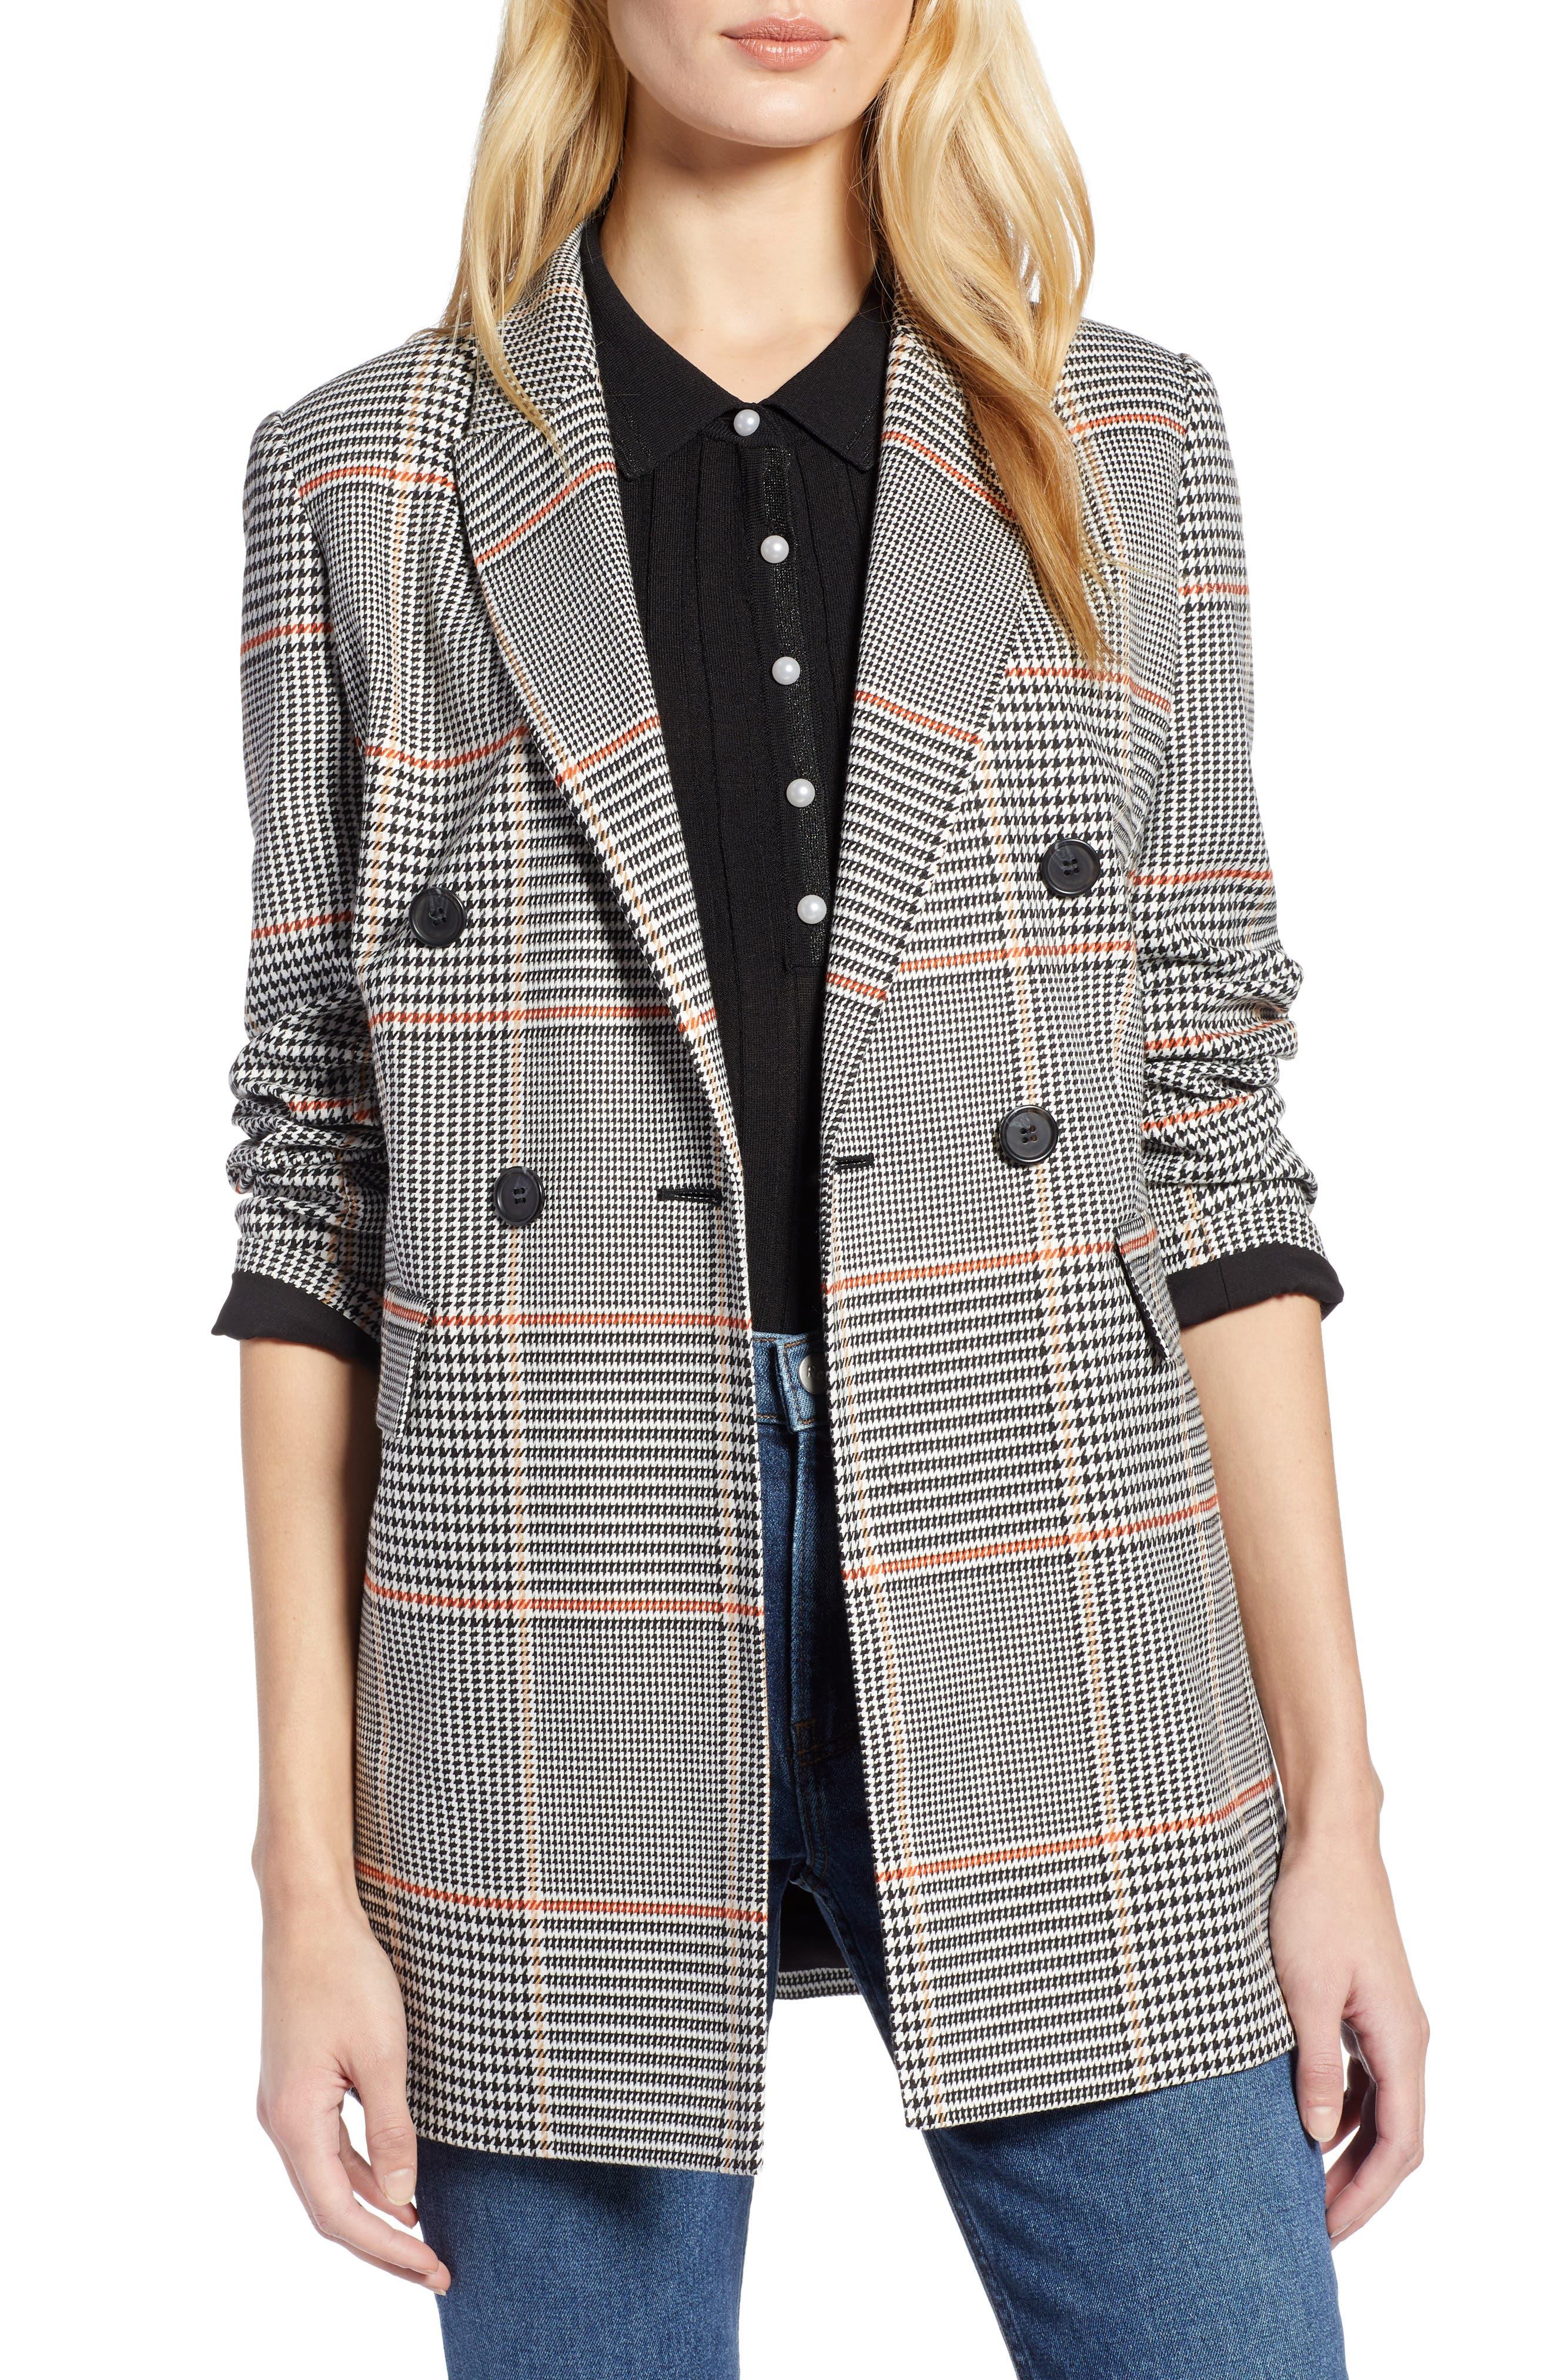 x Atlantic-Pacific Menswear Plaid Blazer,                             Main thumbnail 1, color,                             001